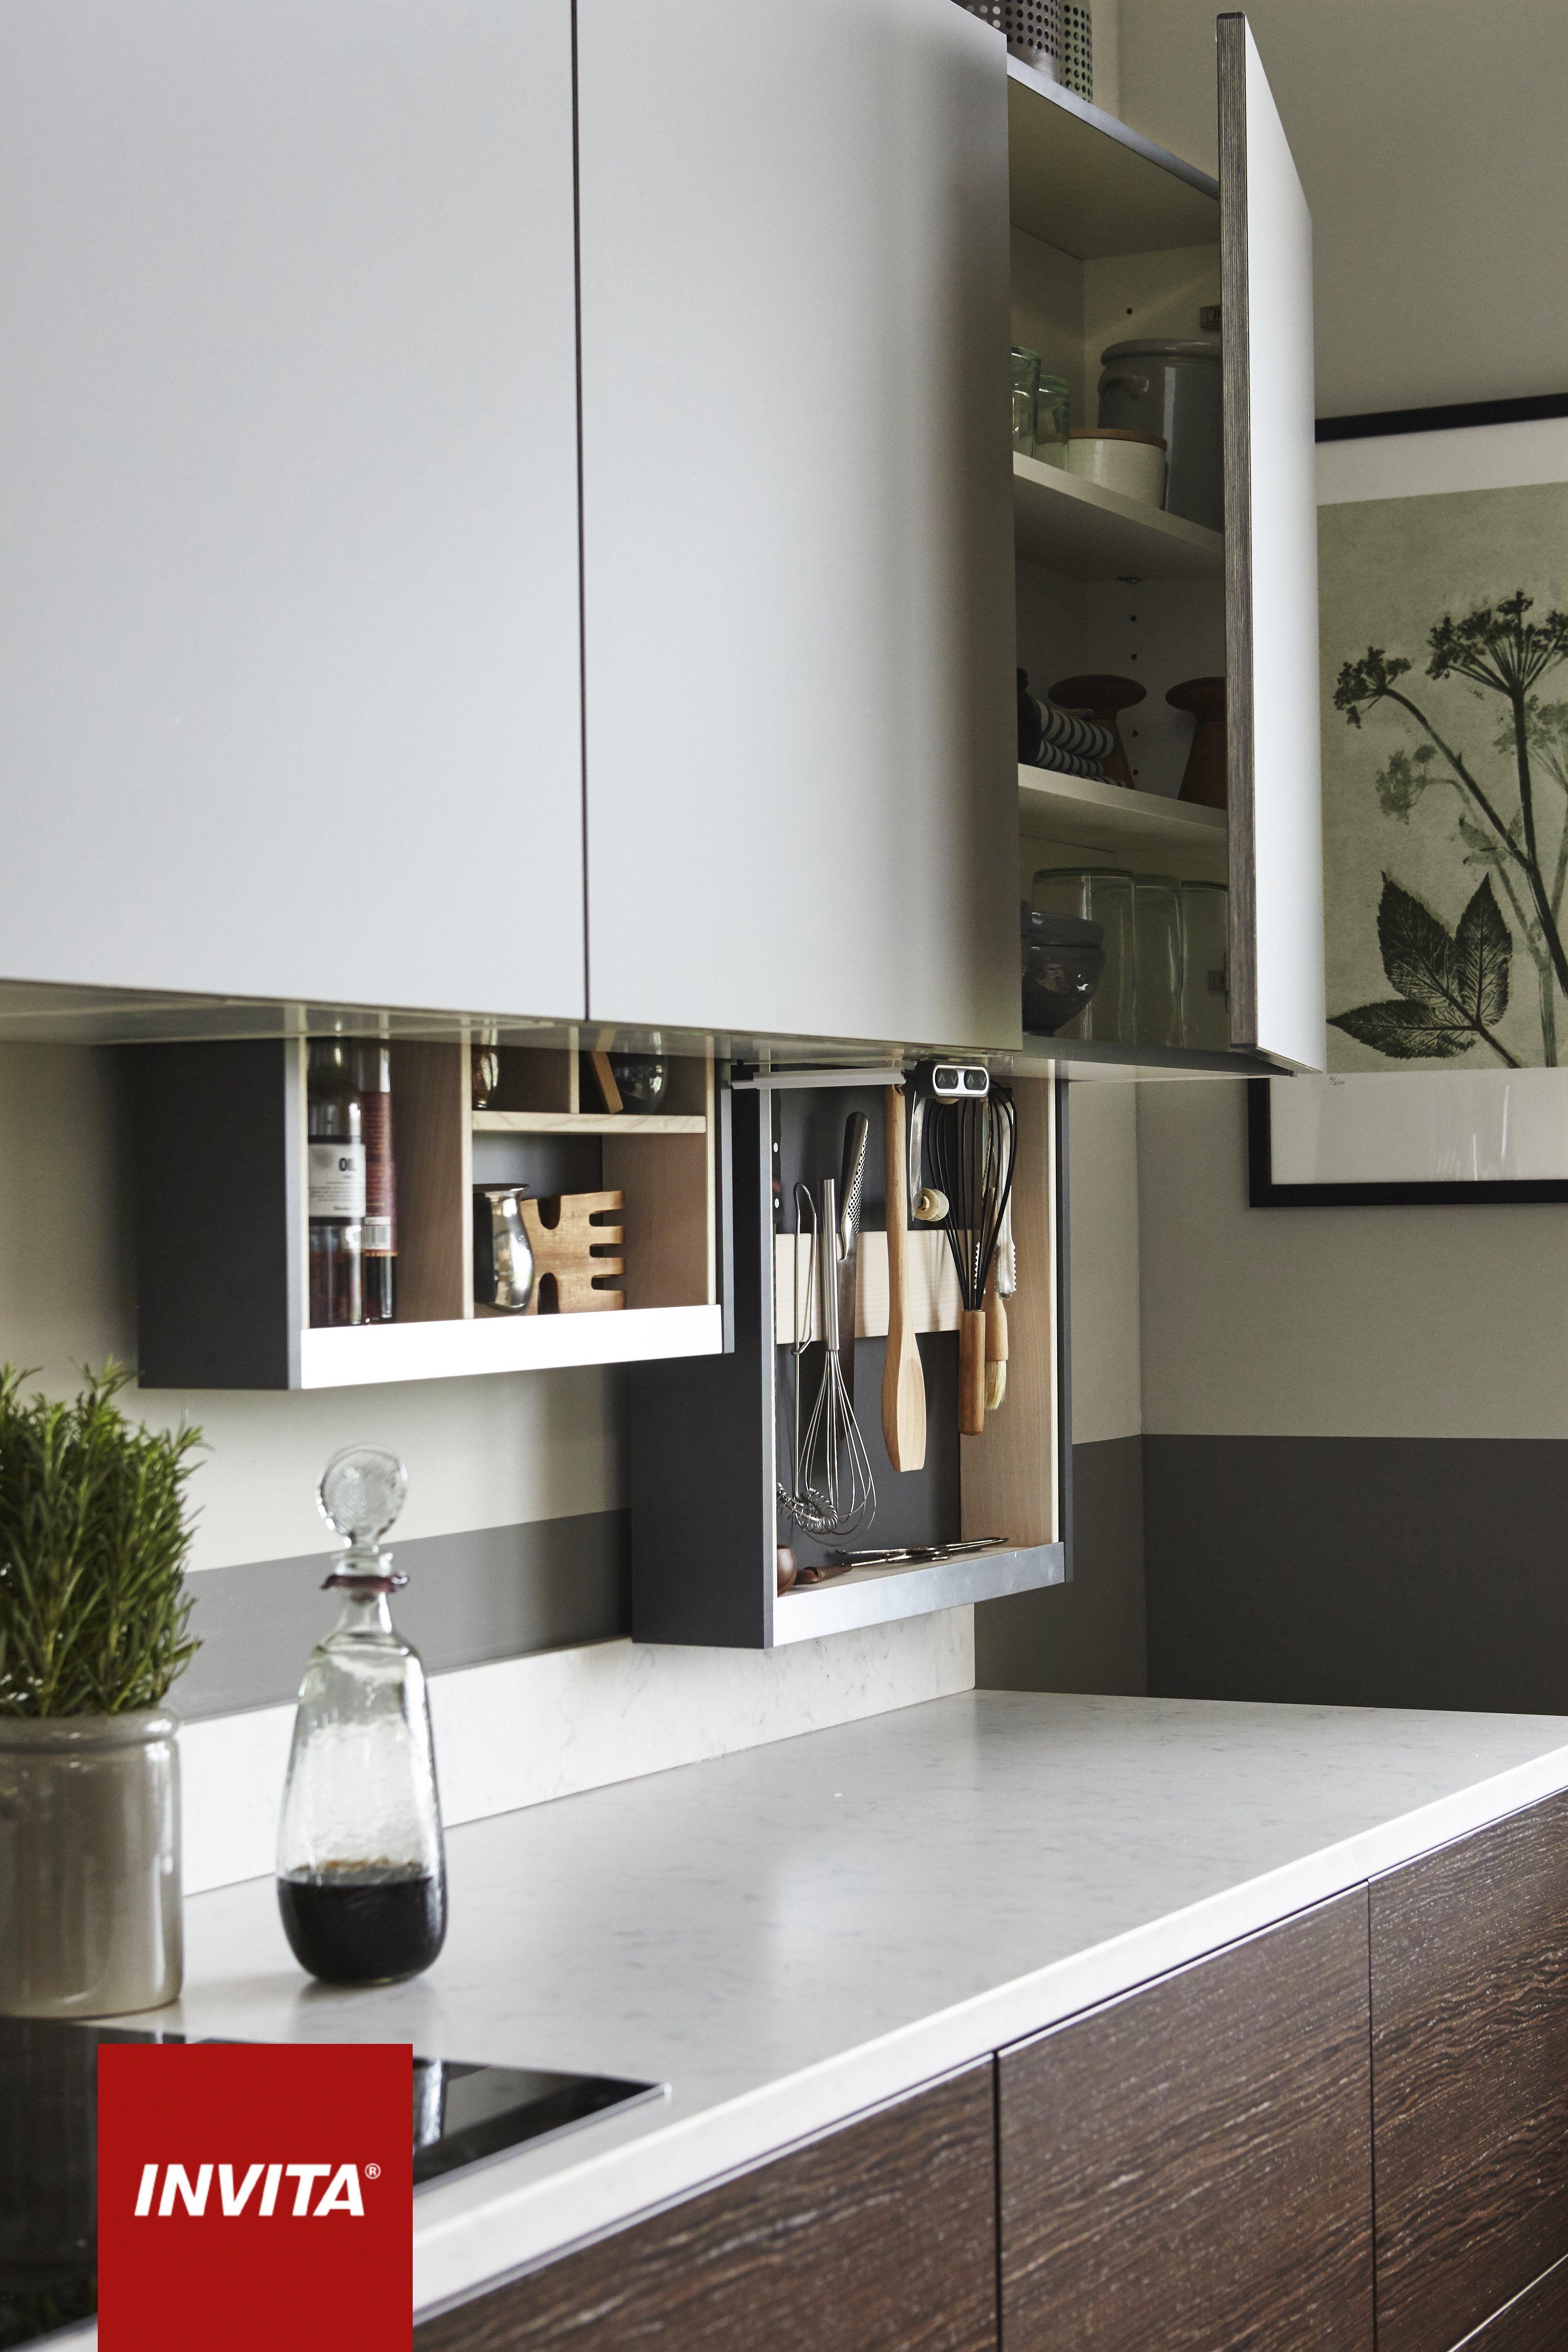 Den specielle ovnskuffe er designet, så den udnytter soklens højde ...